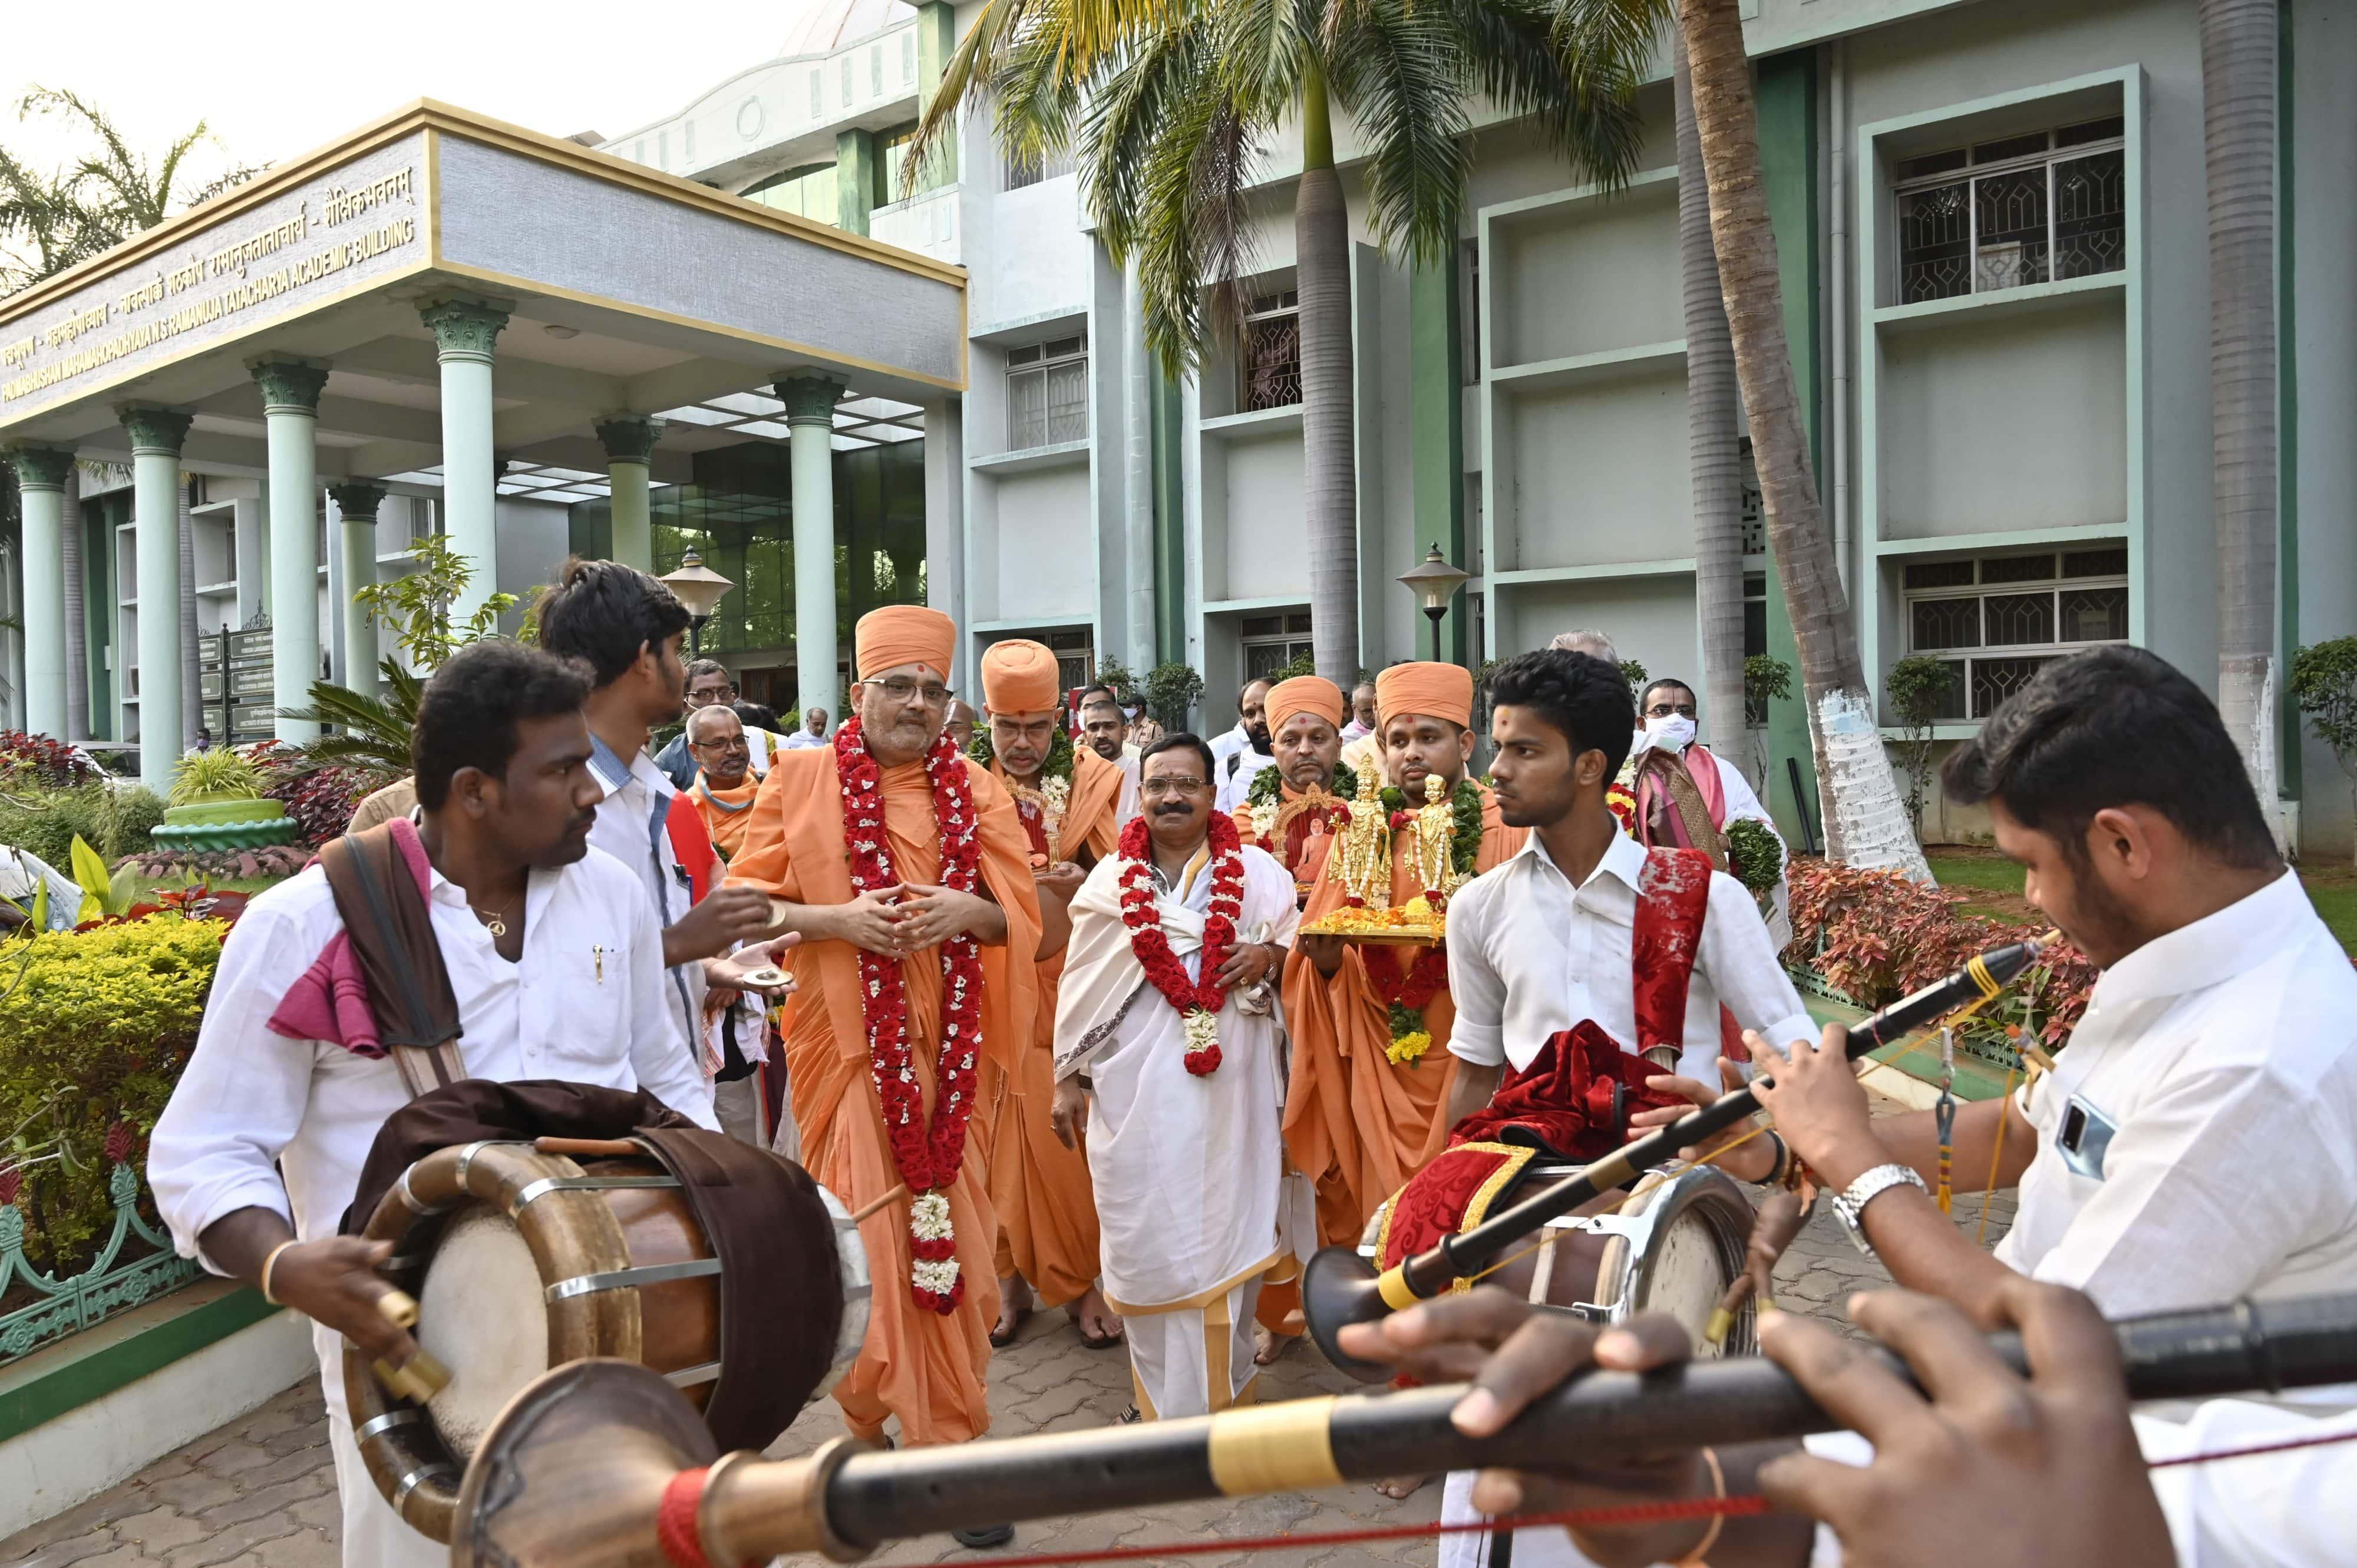 Procession Welcoming the Akṣara-Puruṣottama Darśana